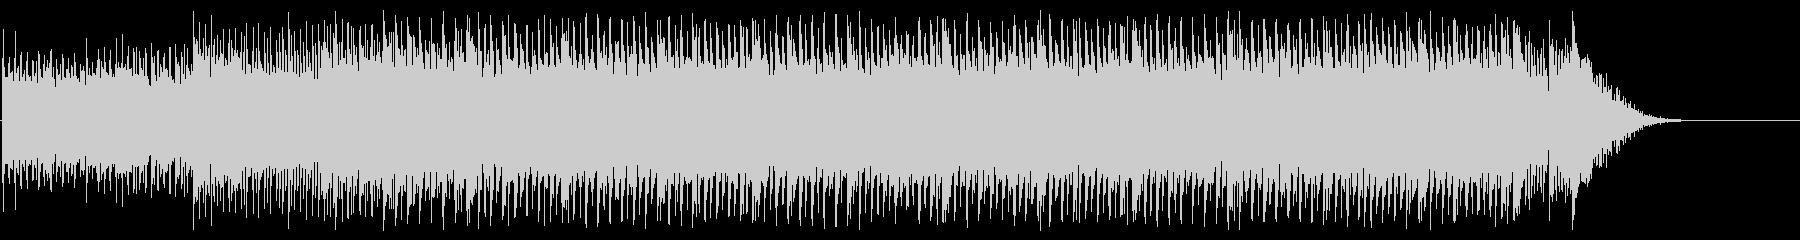 CM インフォメーション 情報 店内の未再生の波形